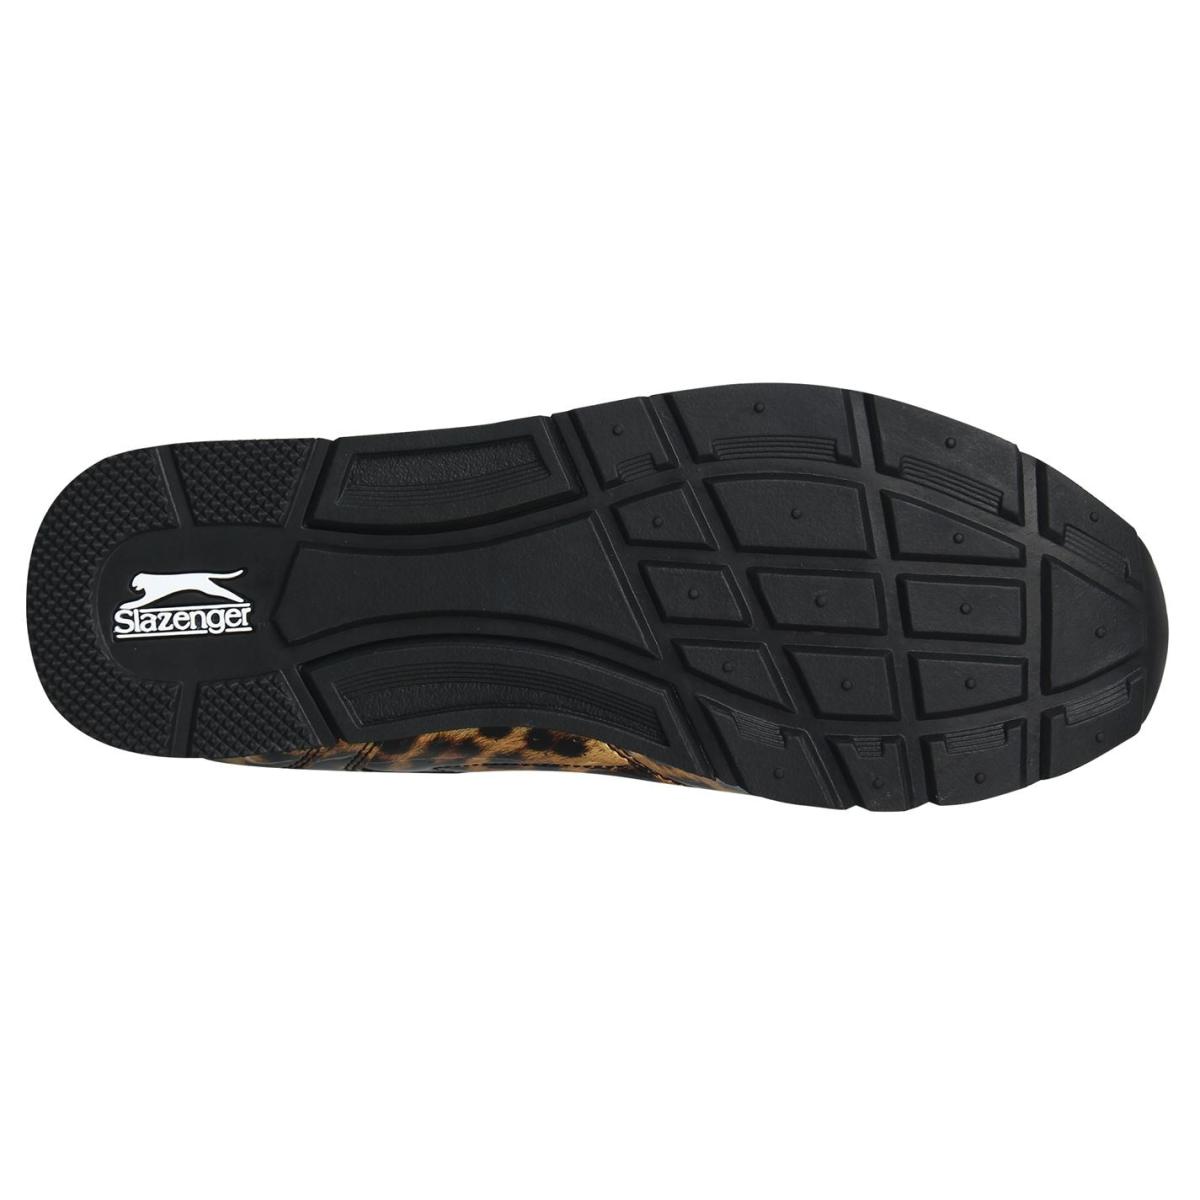 Slazenger-Classic-Turnschuhe-Laufschuhe-Damen-Sportschuhe-Sneaker-1265 Indexbild 11